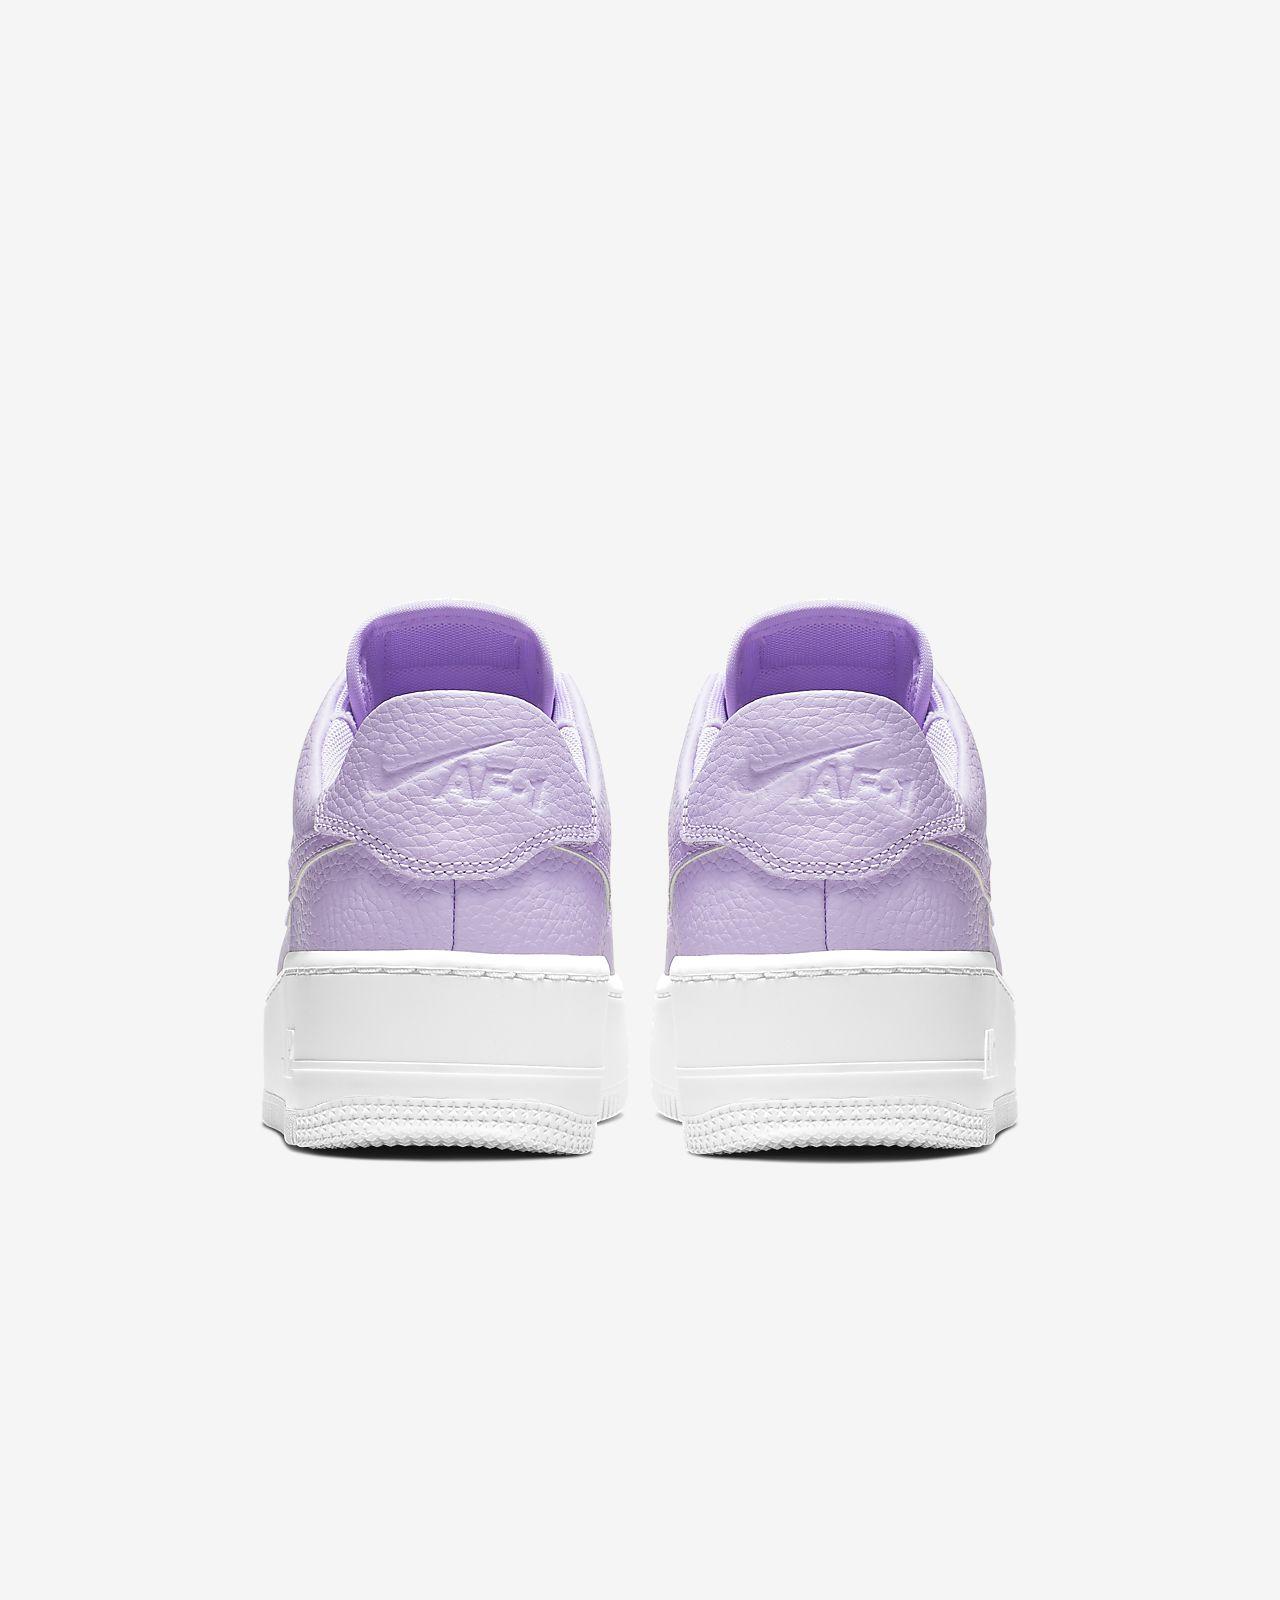 official photos b4df6 fce18 ... Chaussure Nike Air Force 1 Sage Low pour Femme